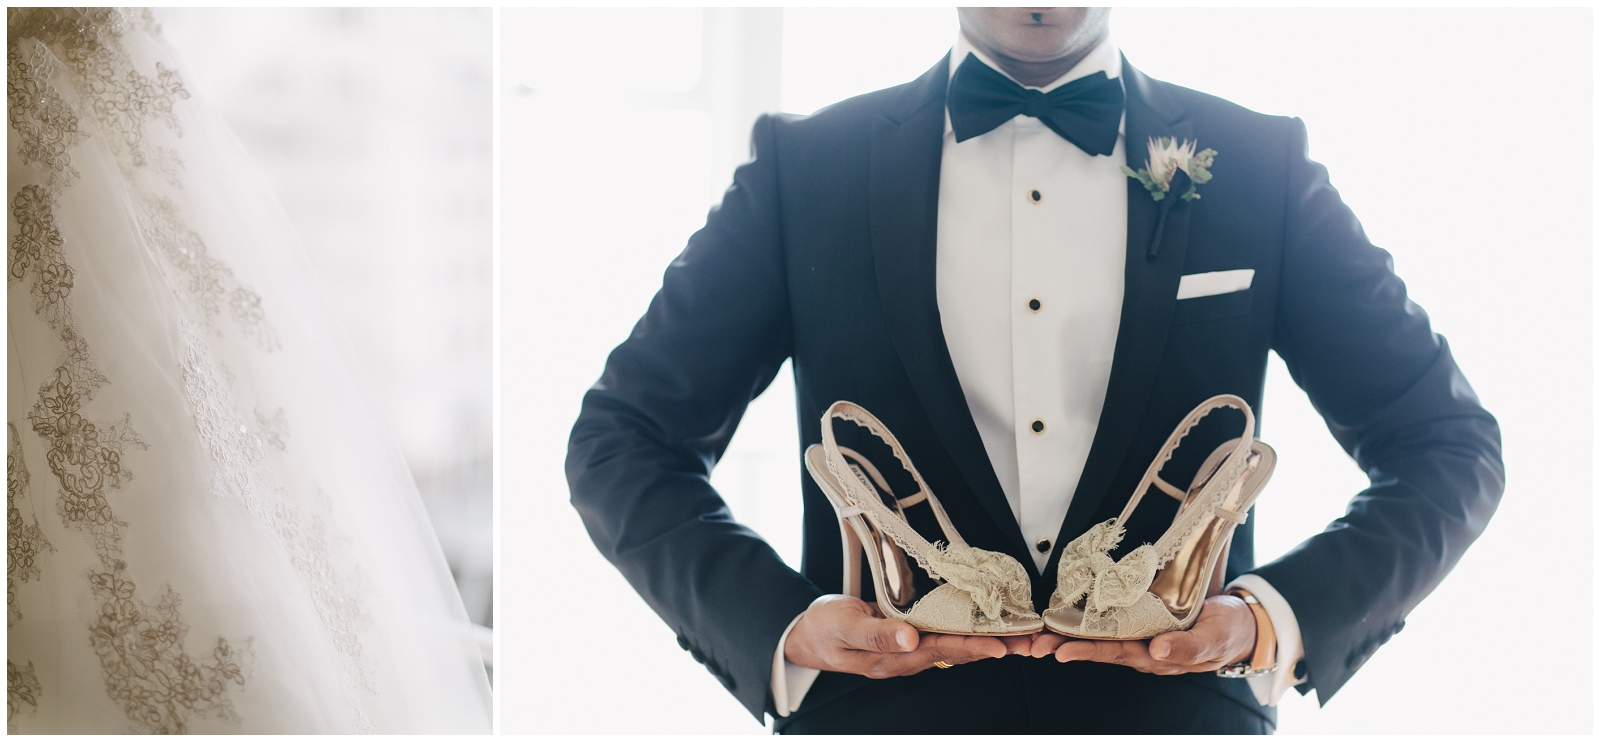 San-Francisco-Bay-Area-Wedding-Photography-Claremont-Hotel-6.jpg